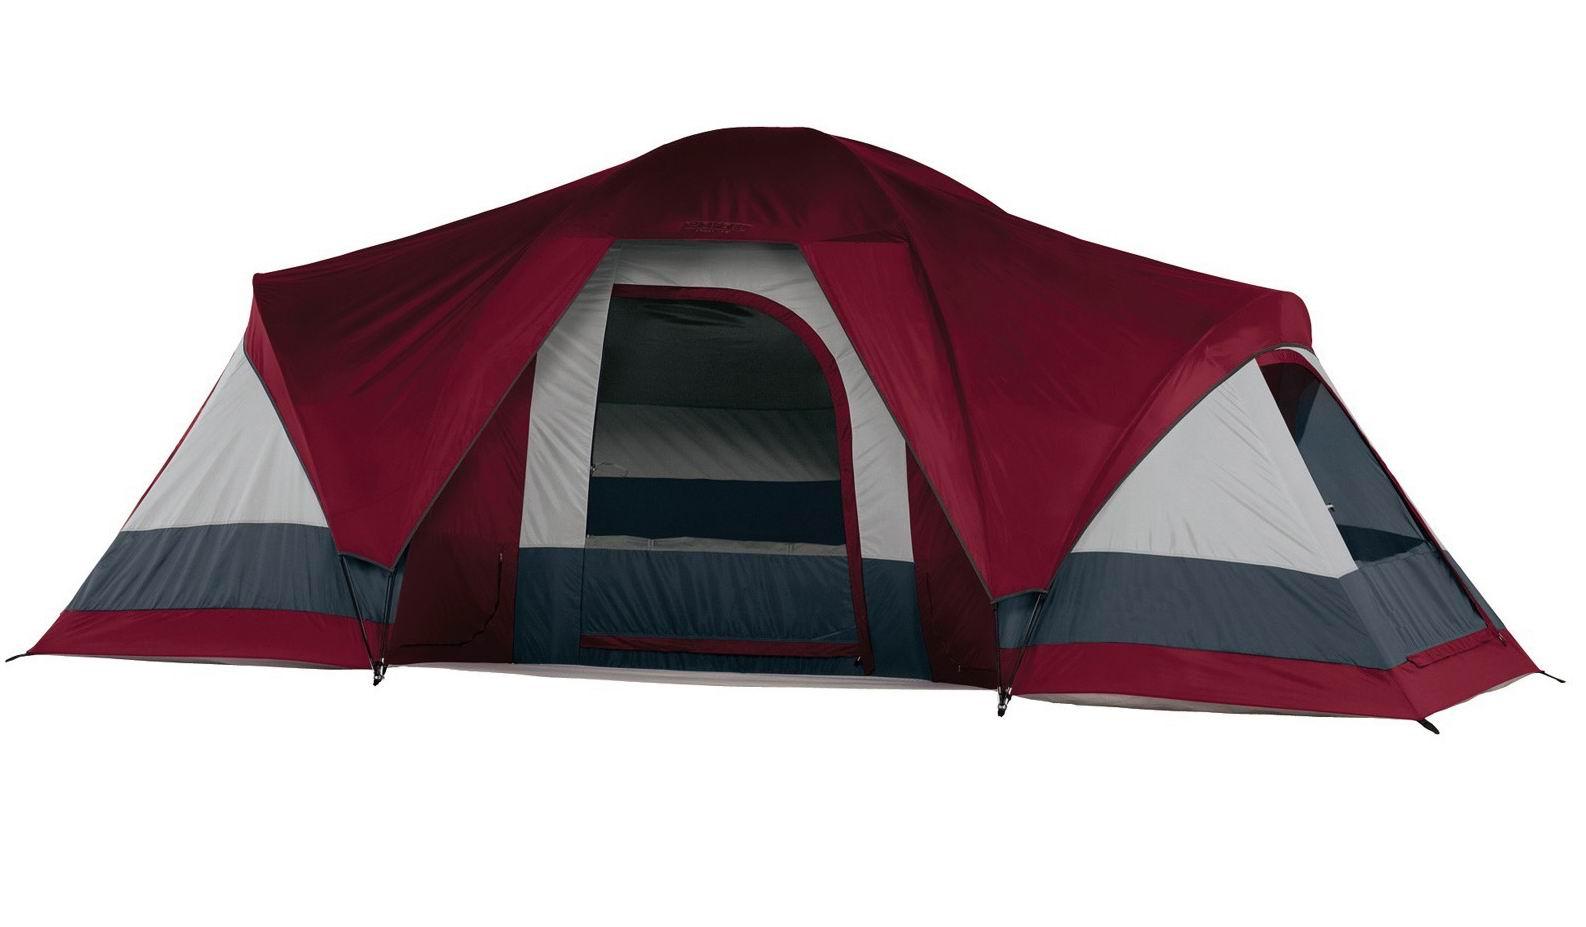 Available Tent Rentals  sc 1 st  Bella Solviva & Bella Solviva - Michiganu0027s Comfy Glamping u0026 Camping Eco-Resort ...